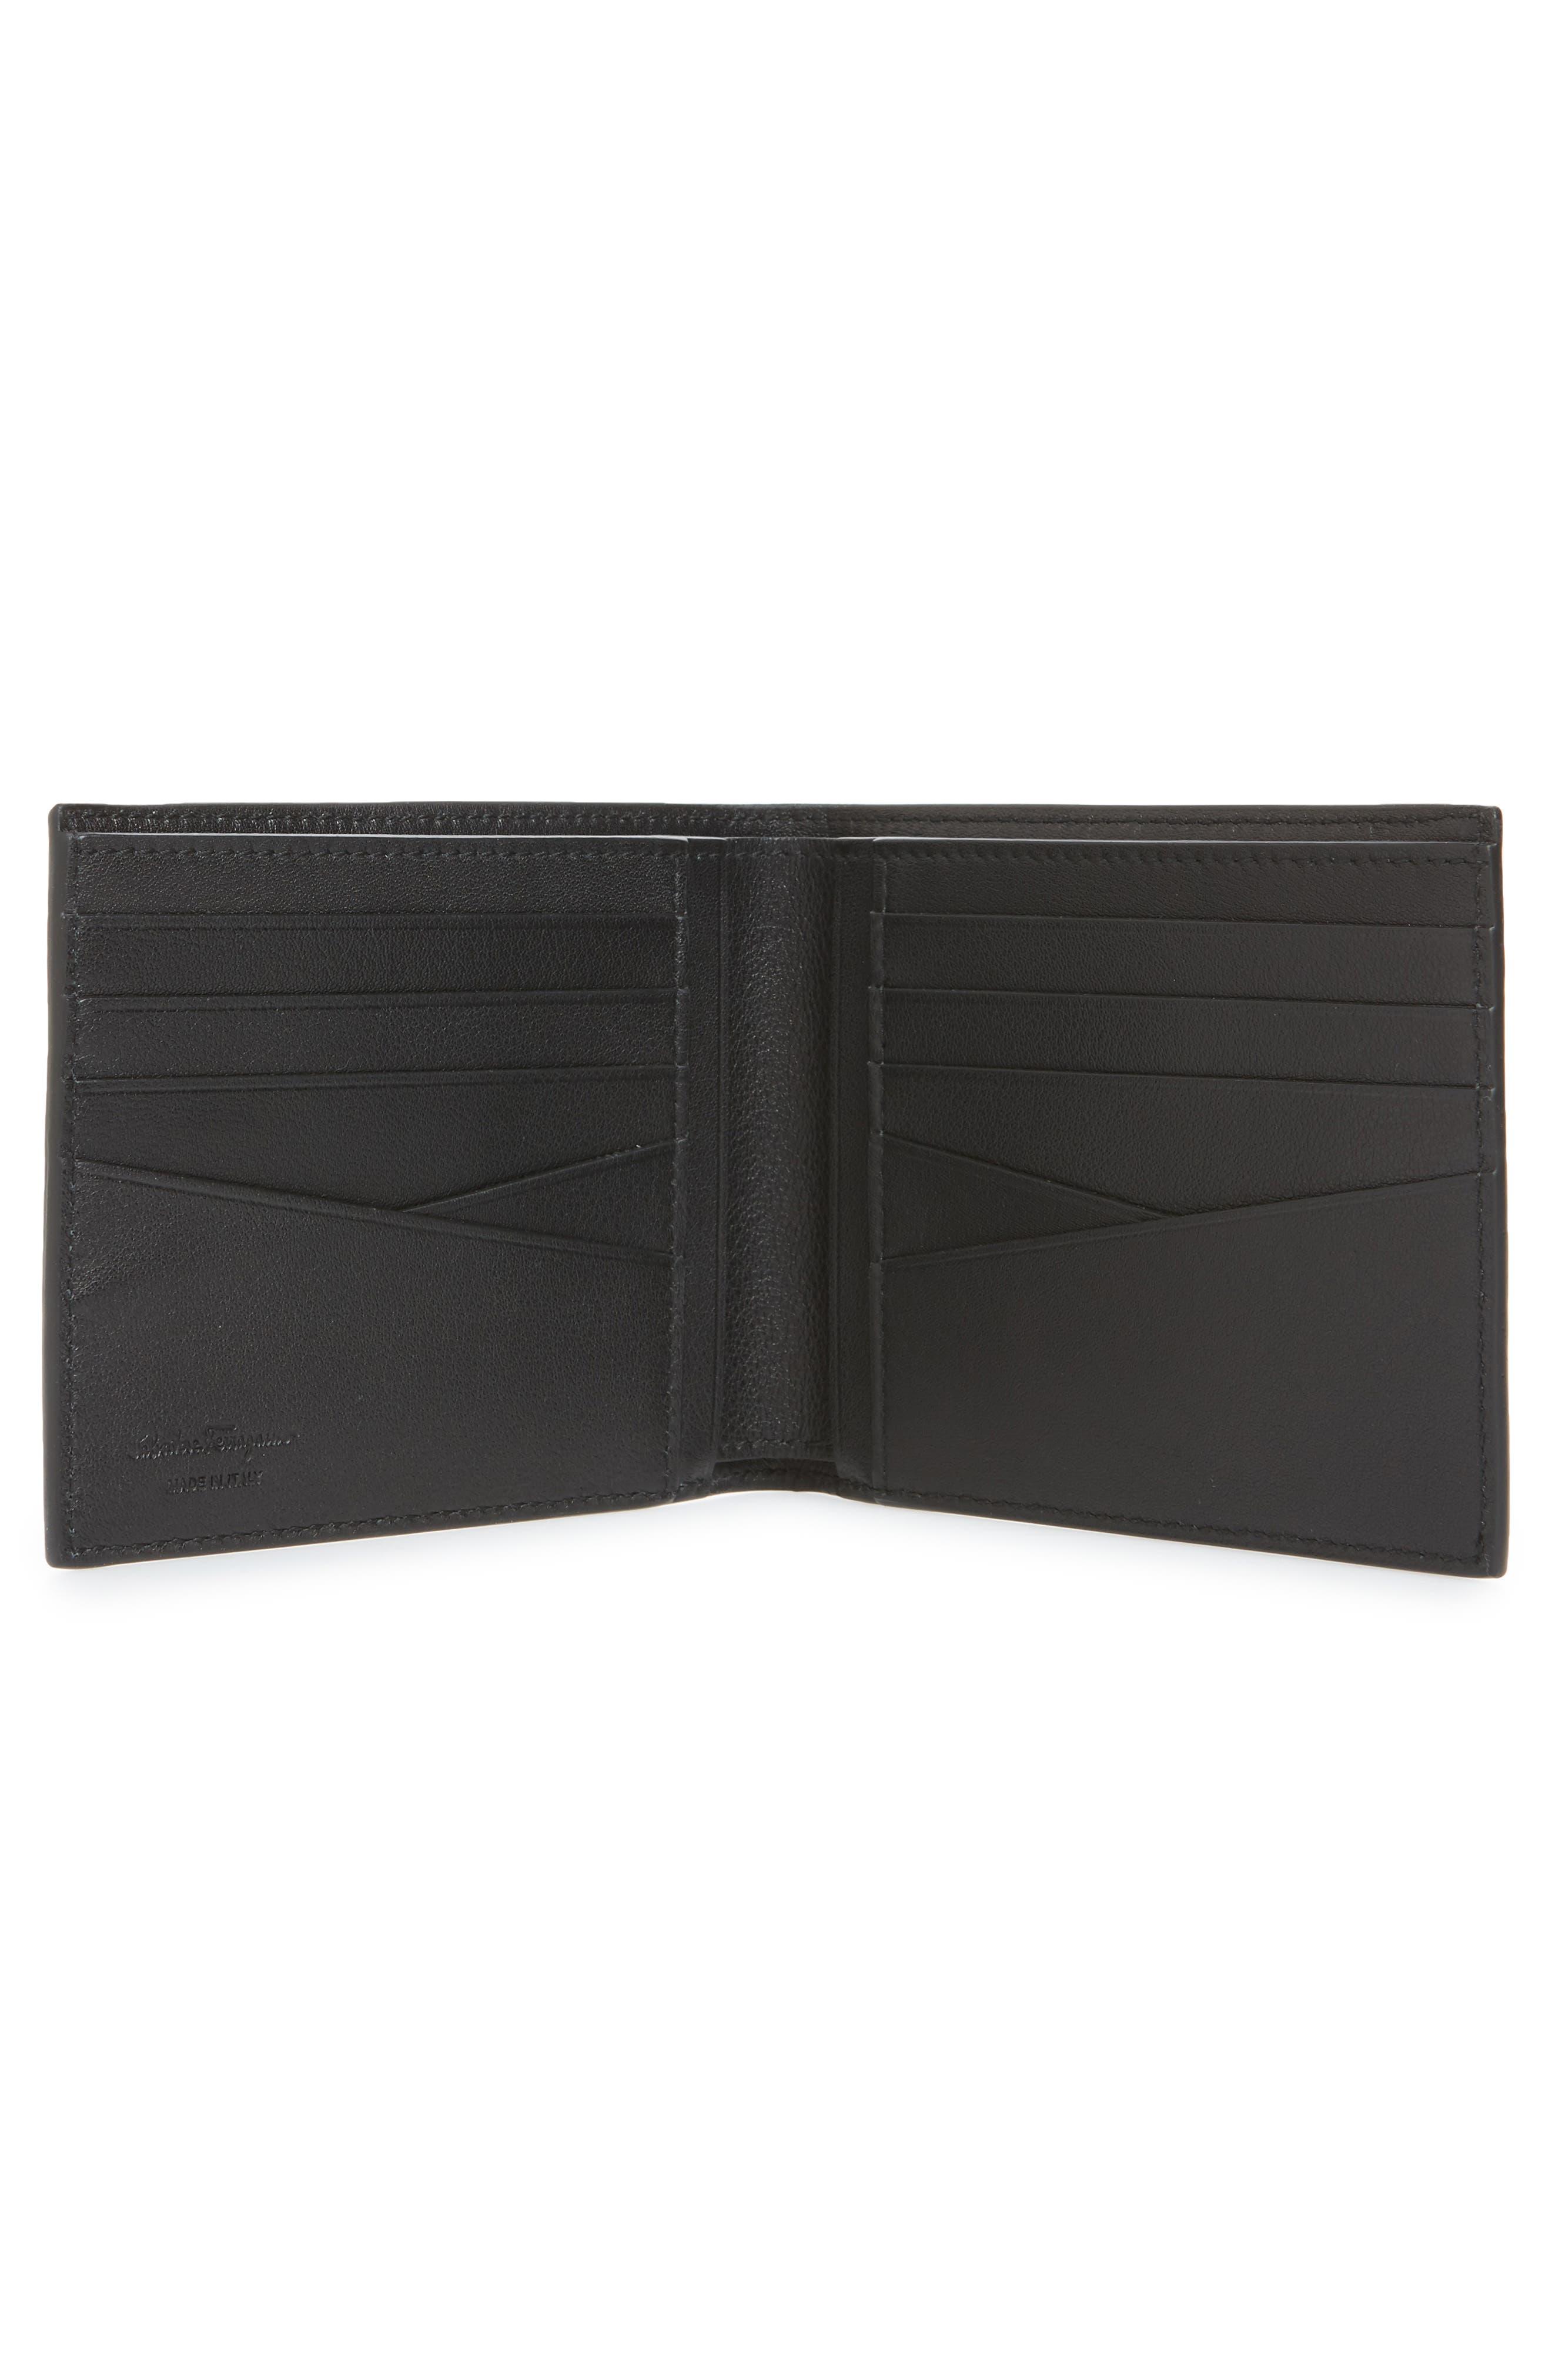 Alternate Image 2  - Salvatore Ferragamo Glow Leather Wallet